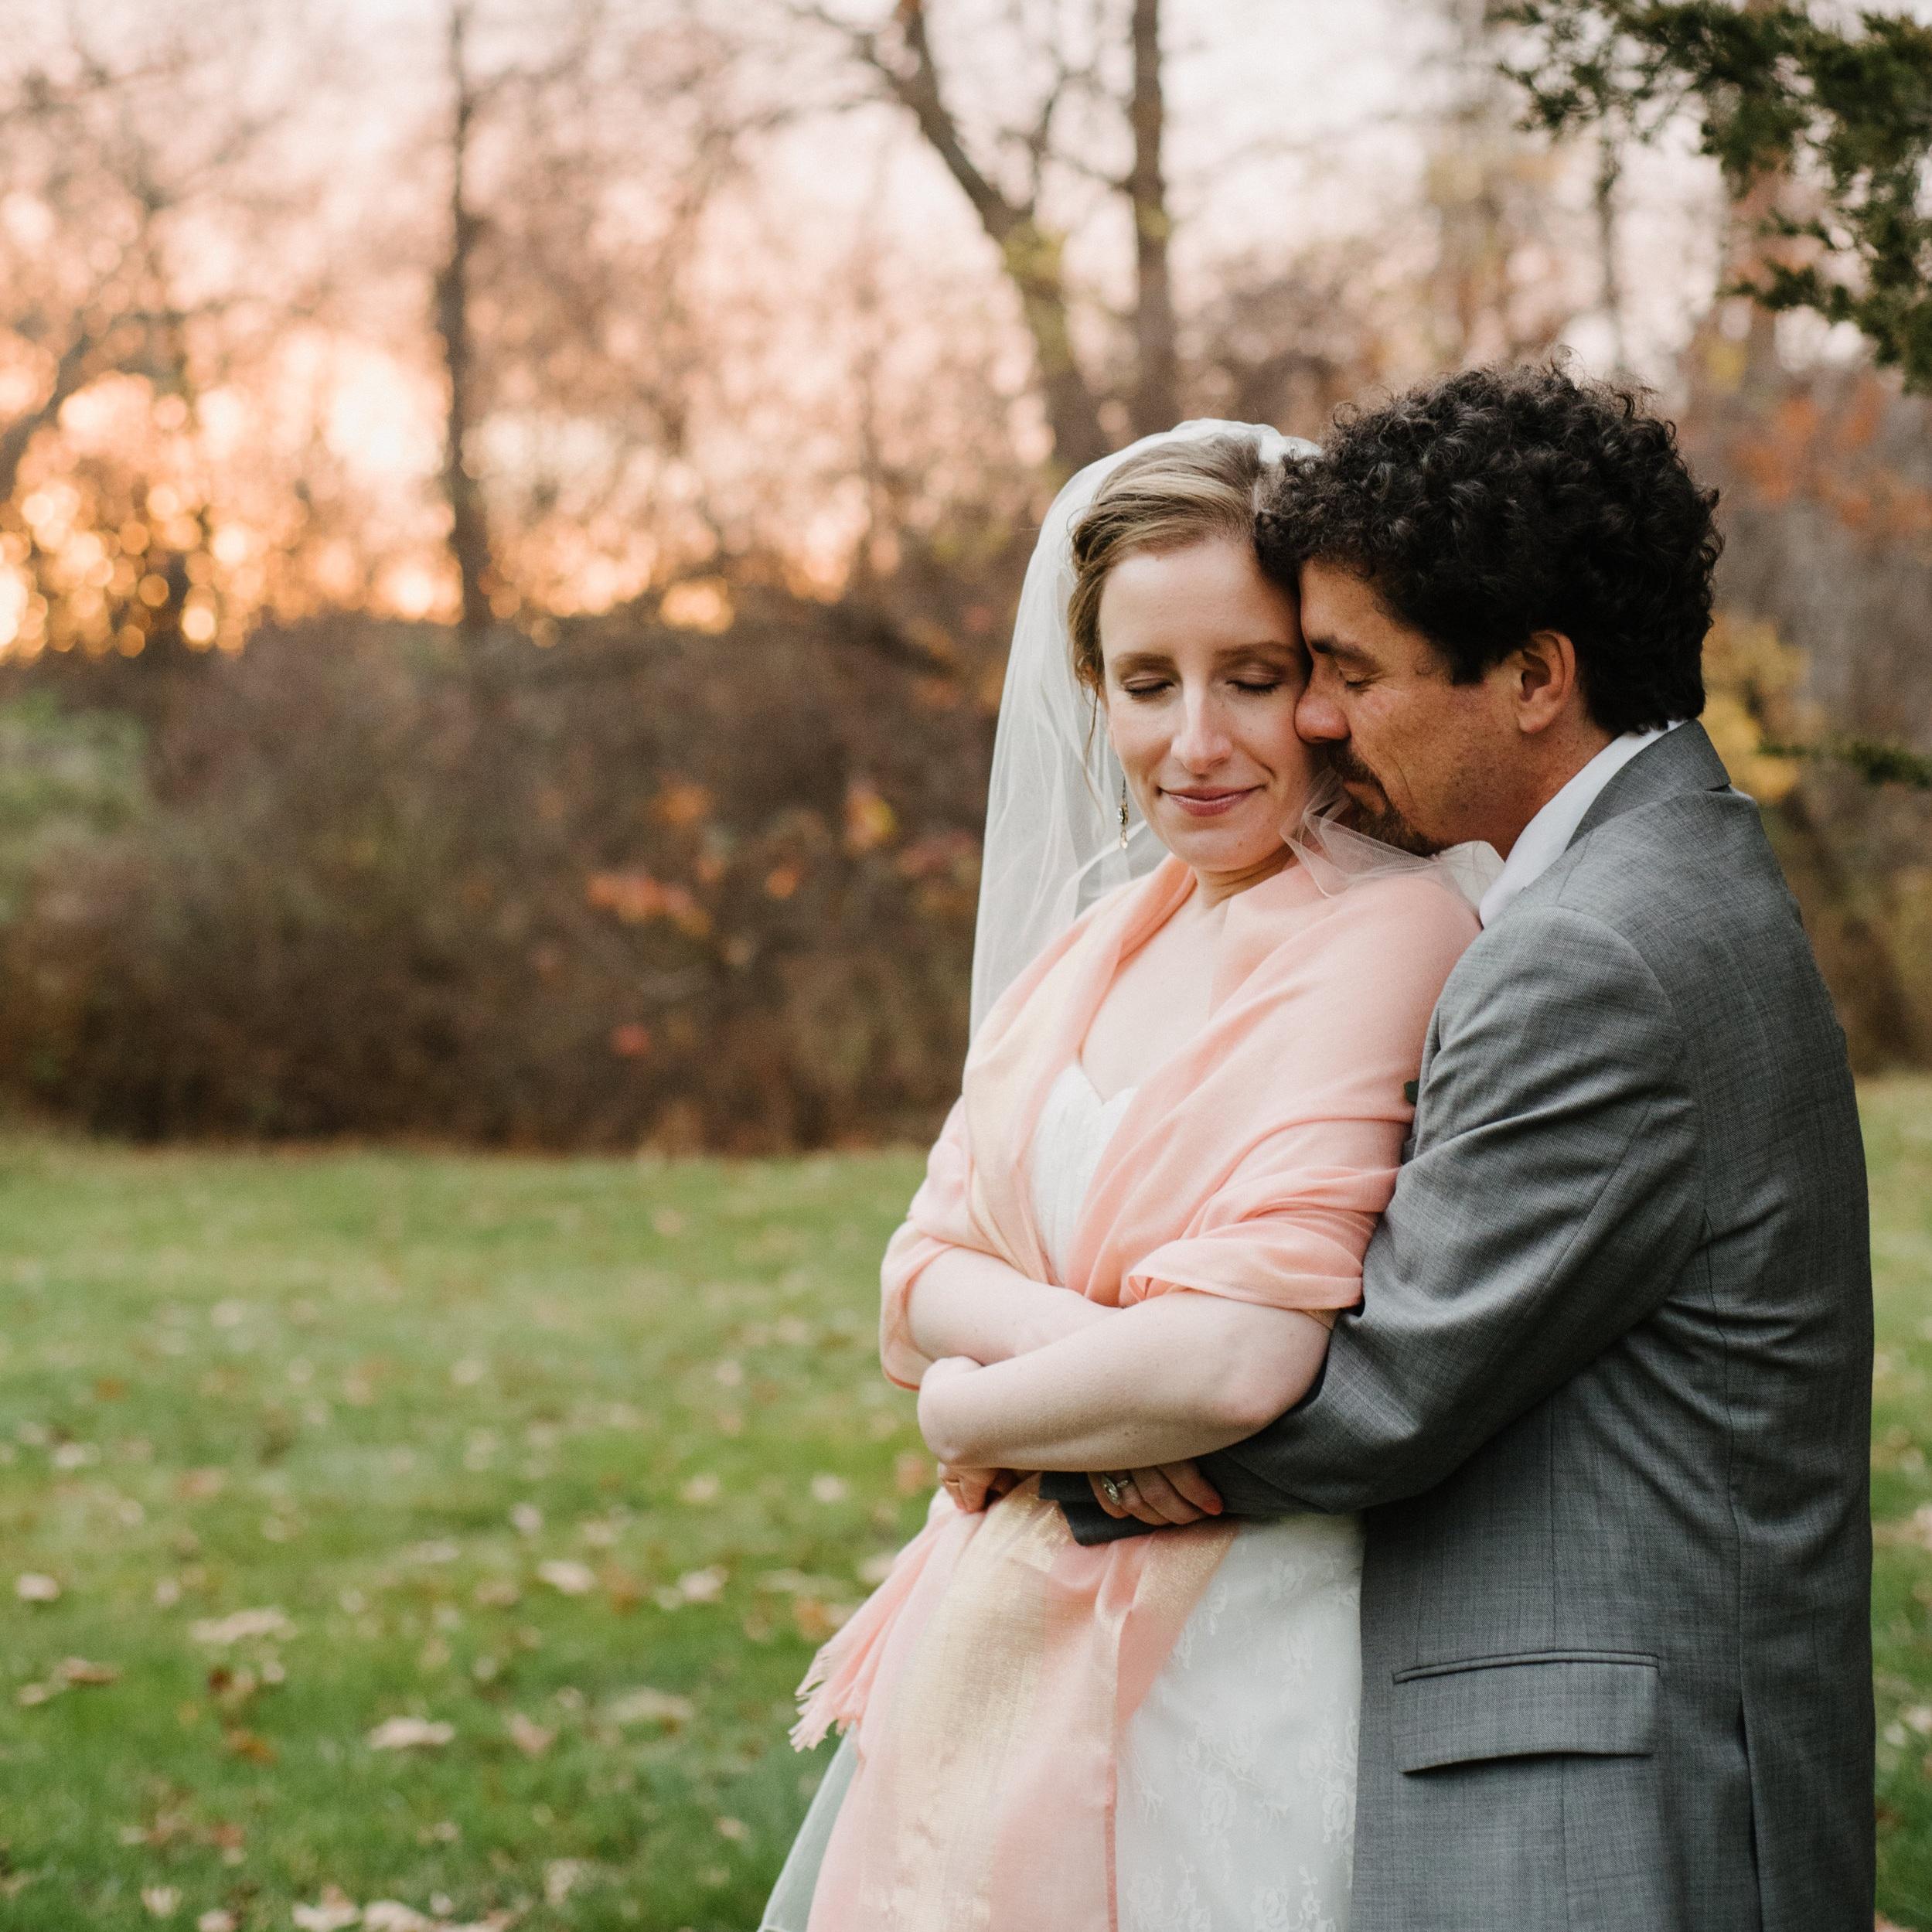 north+shore+massachusetts+boston+wedding+ipswich+hellenic+center+photographer-1.jpg